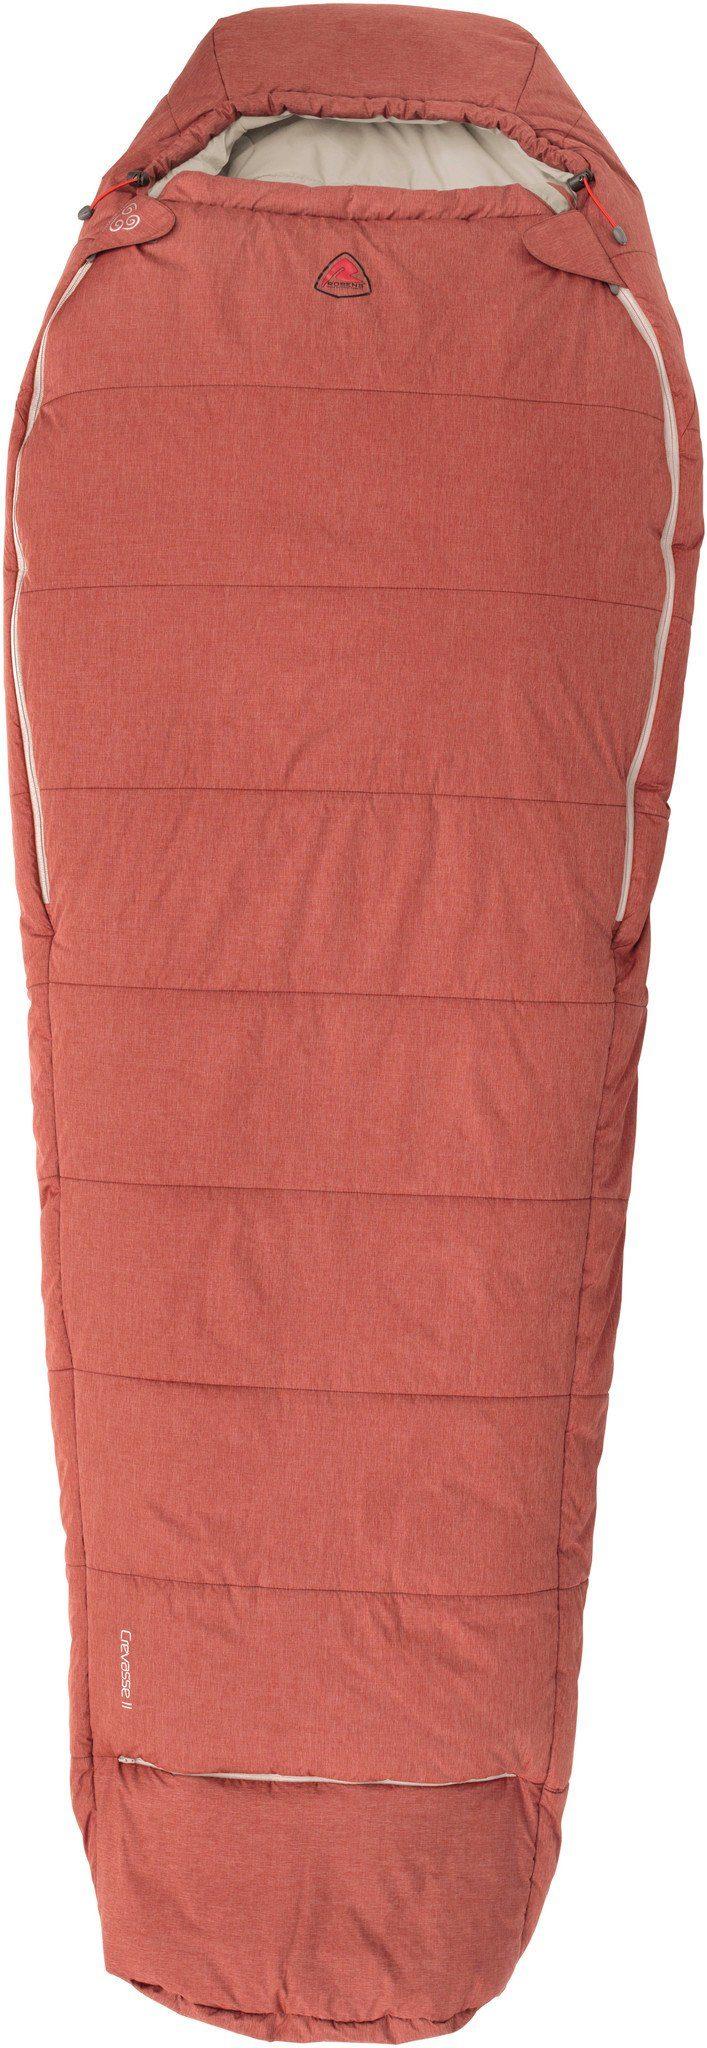 Robens Schlafsack »Crevasse II Sleeping Bag«